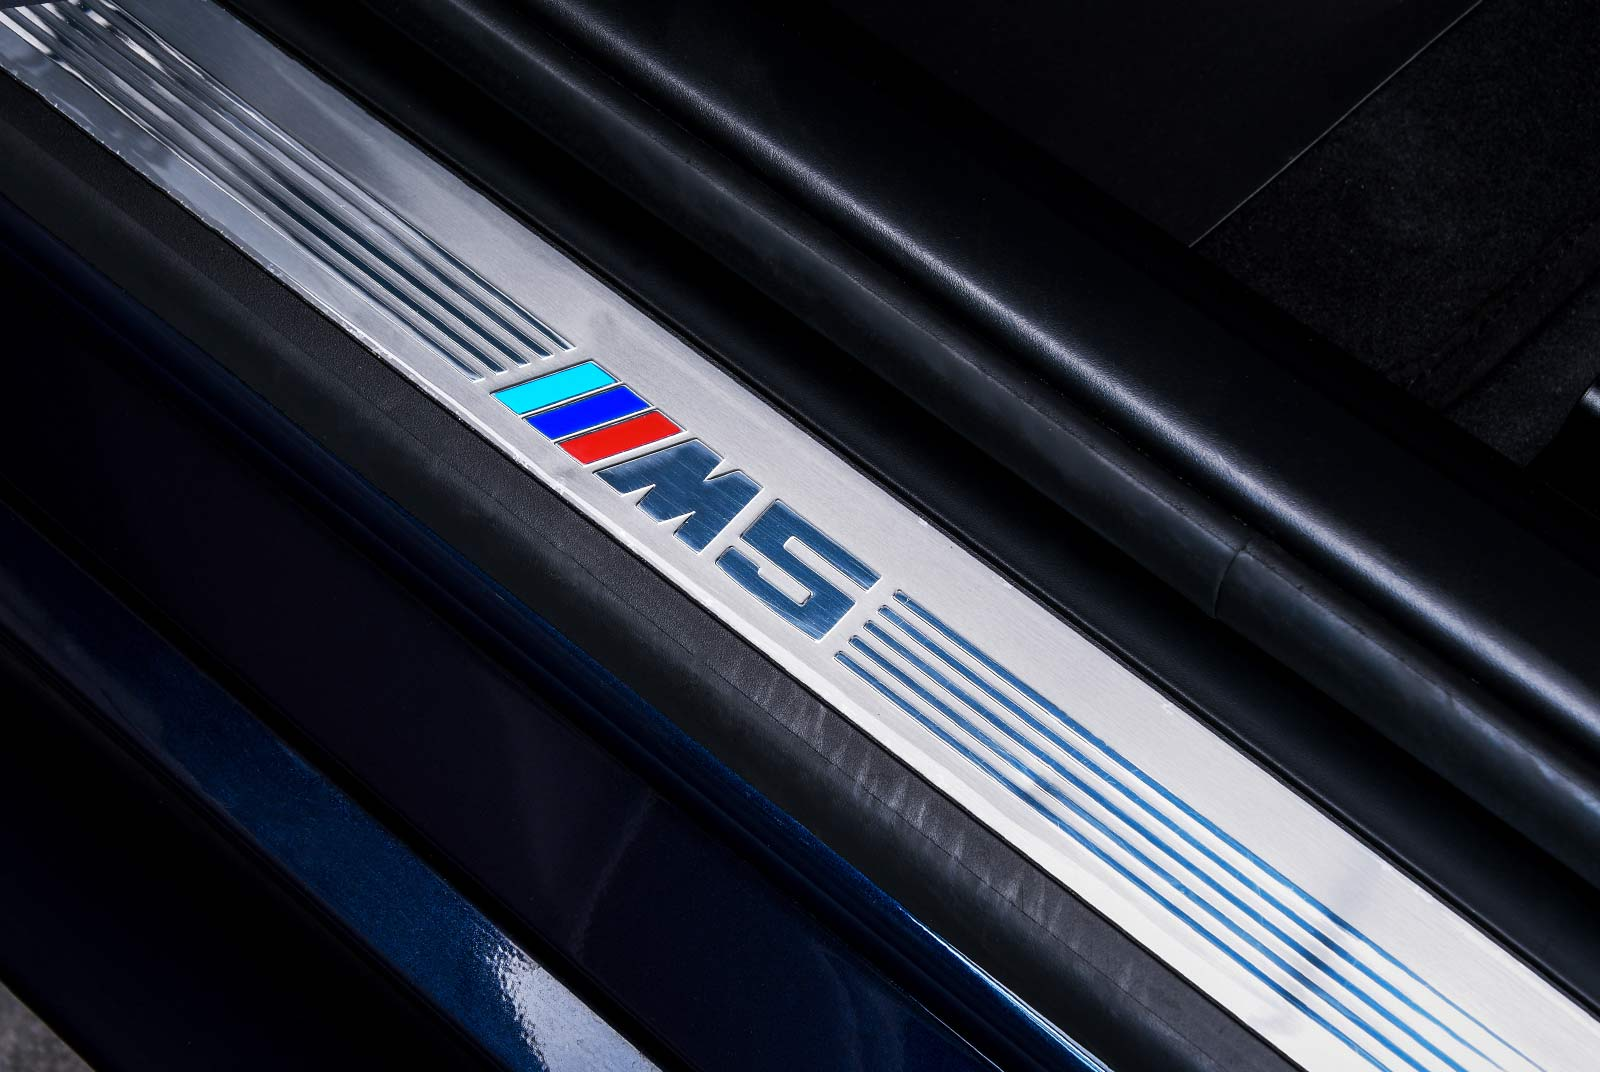 11bmw_m_5_blaulila_creme_BMW-2353_21